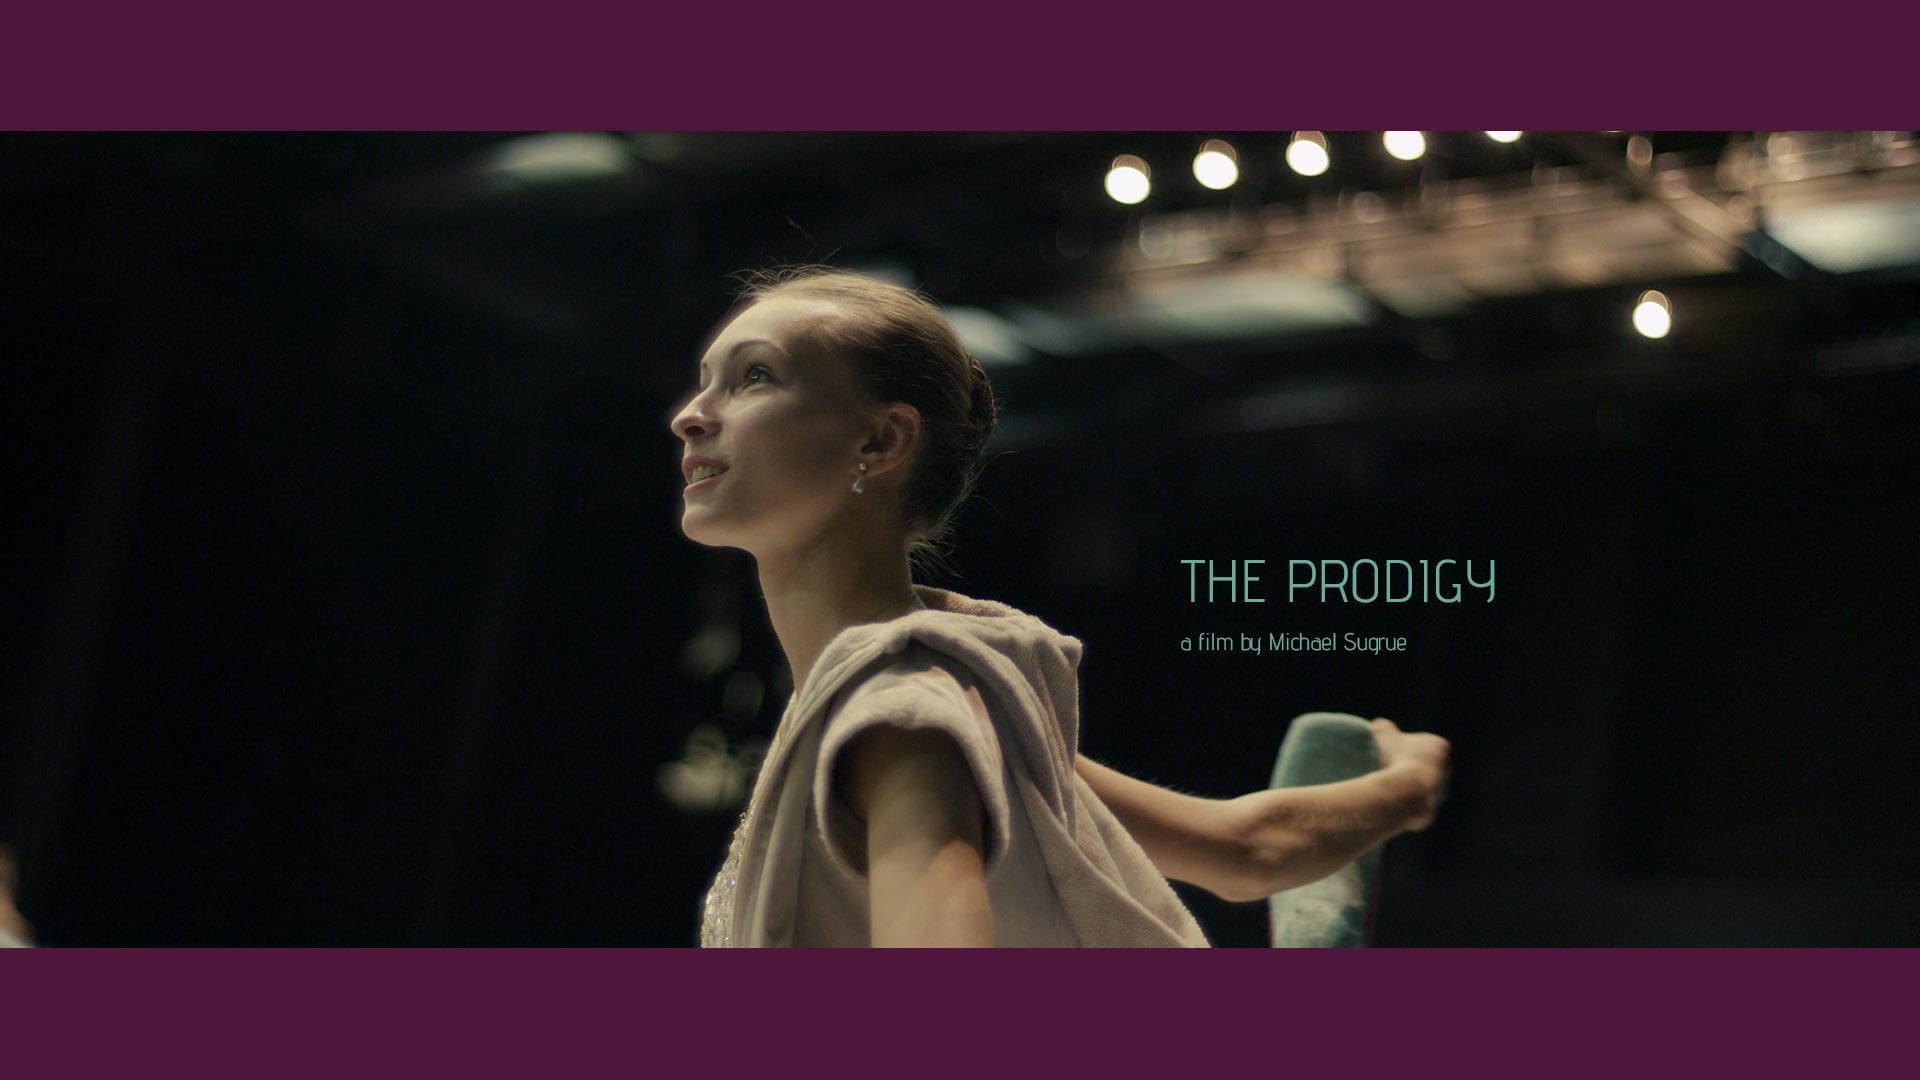 THE PRODIGY Official Trailer (2018 Feminista Film Festival)